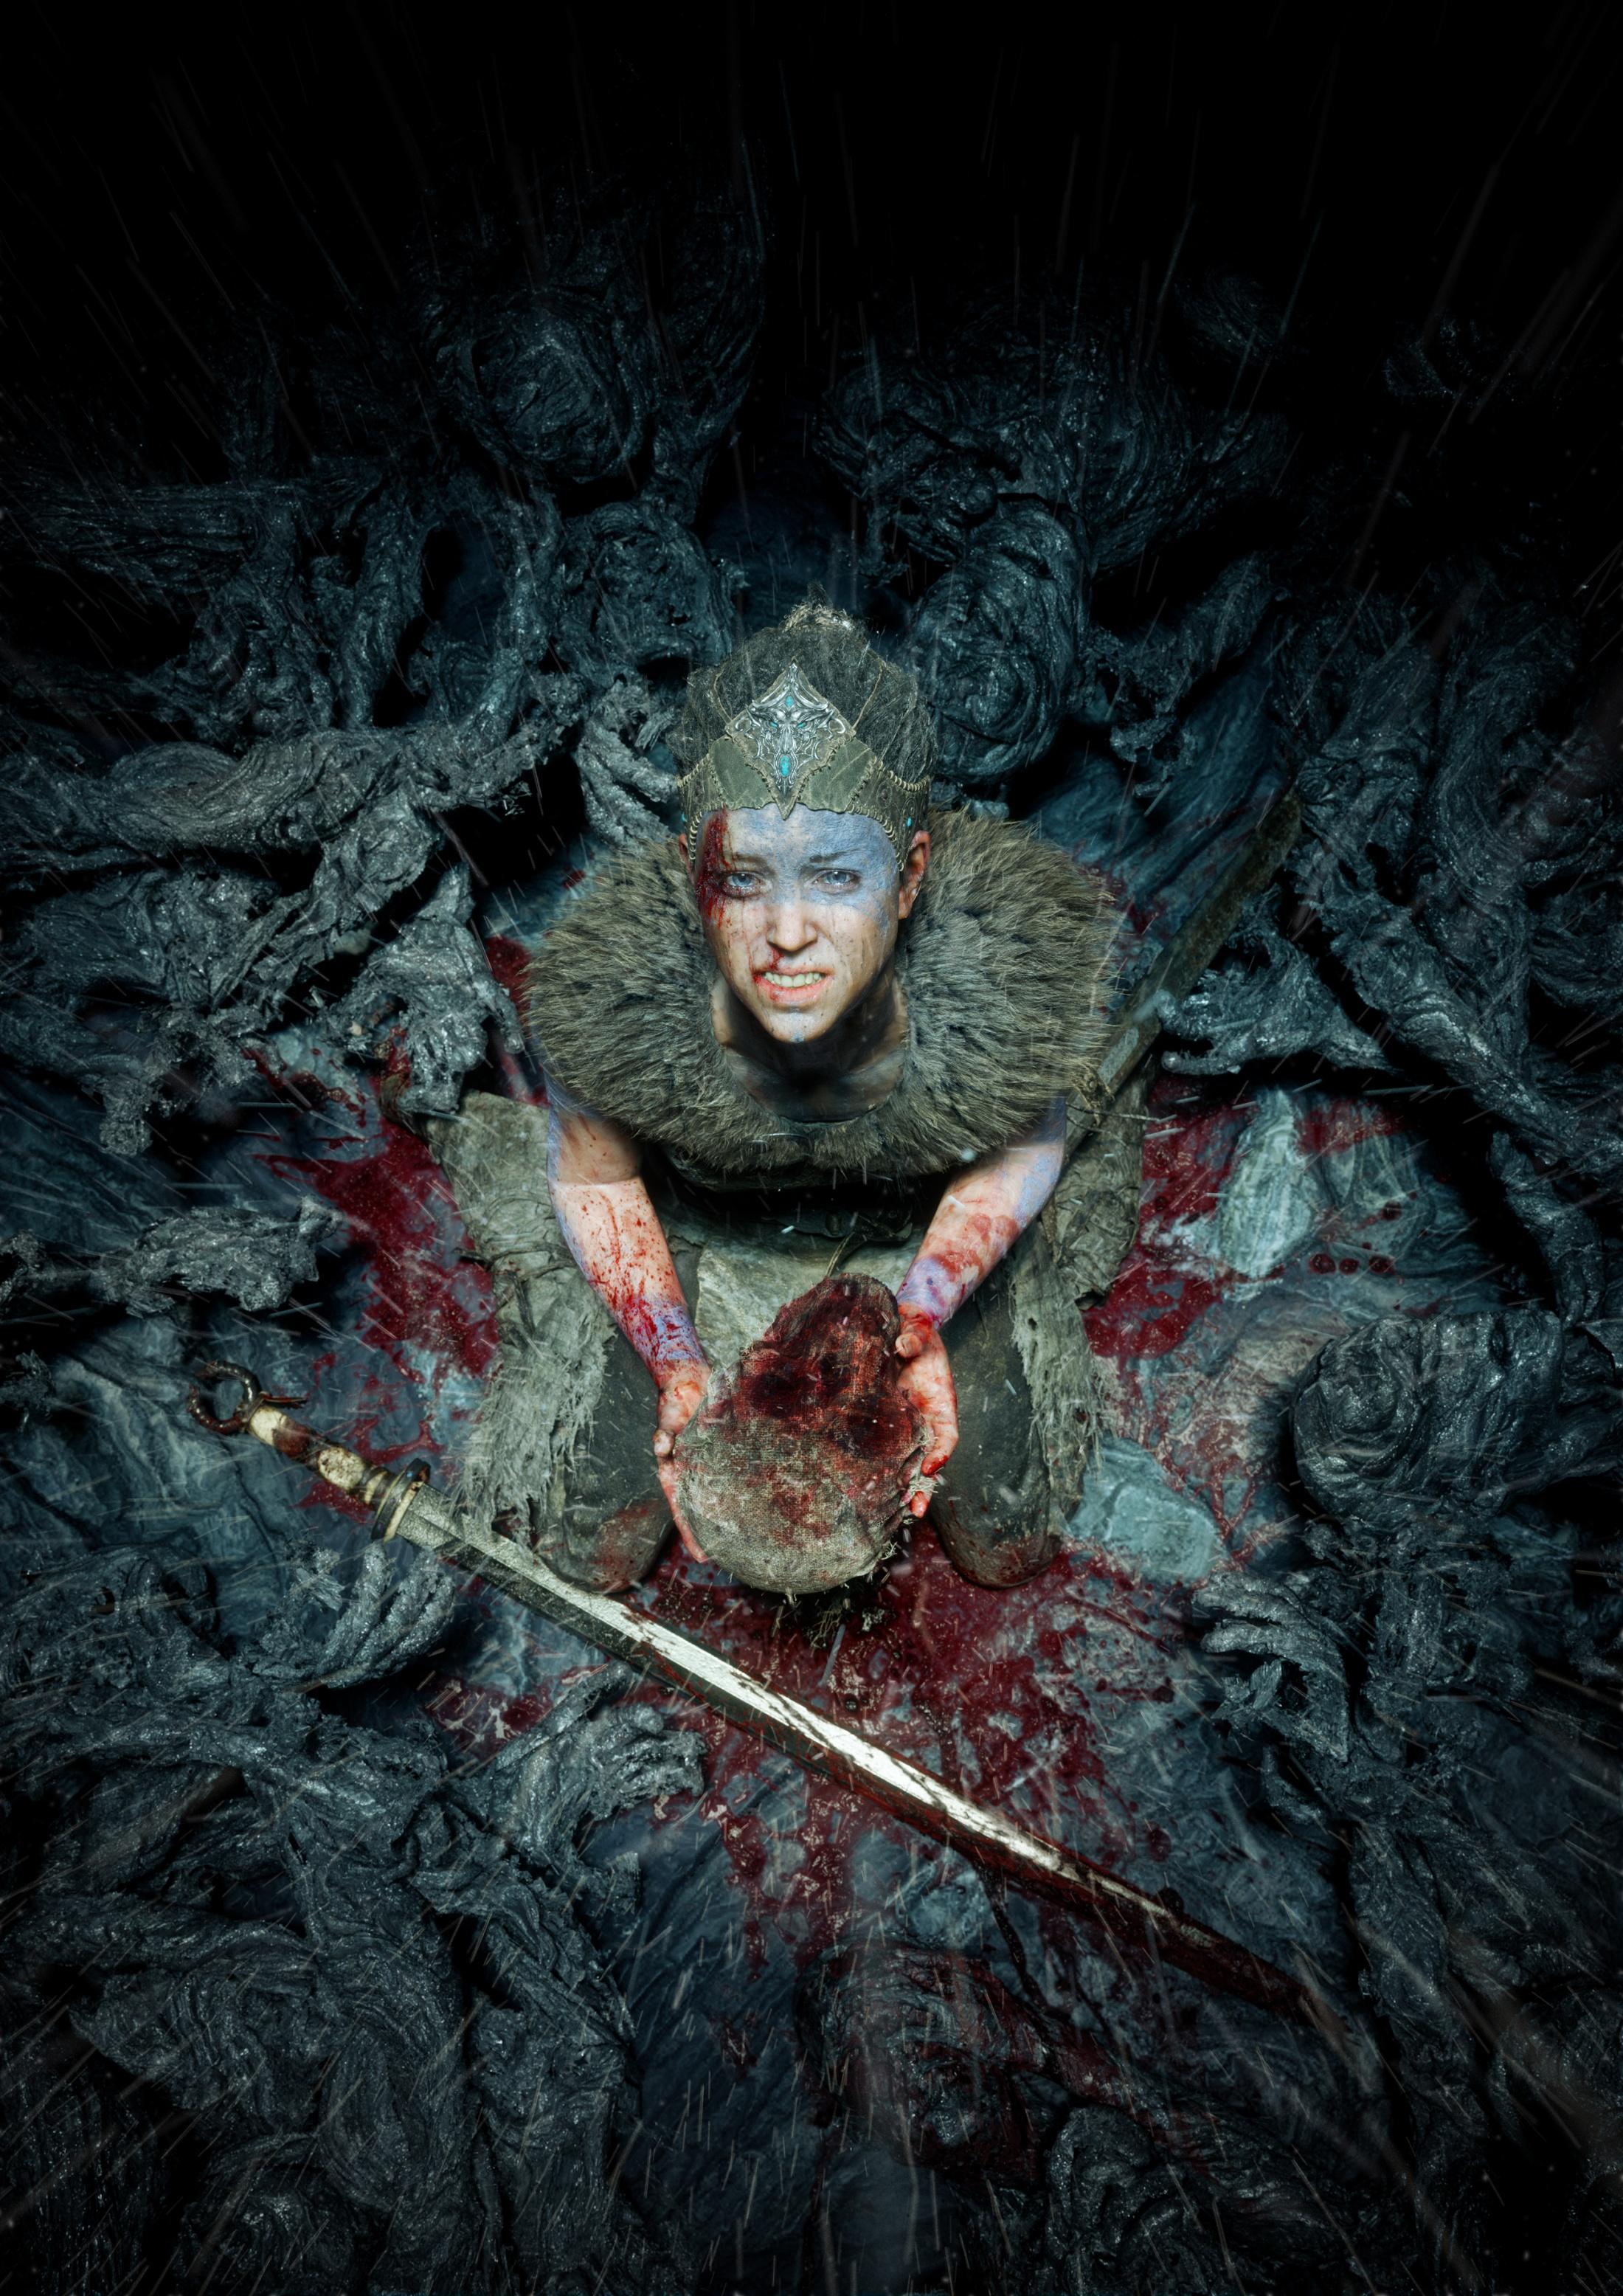 Thumbnail for Hellblade: Senua's Sacrifice Official Trailer